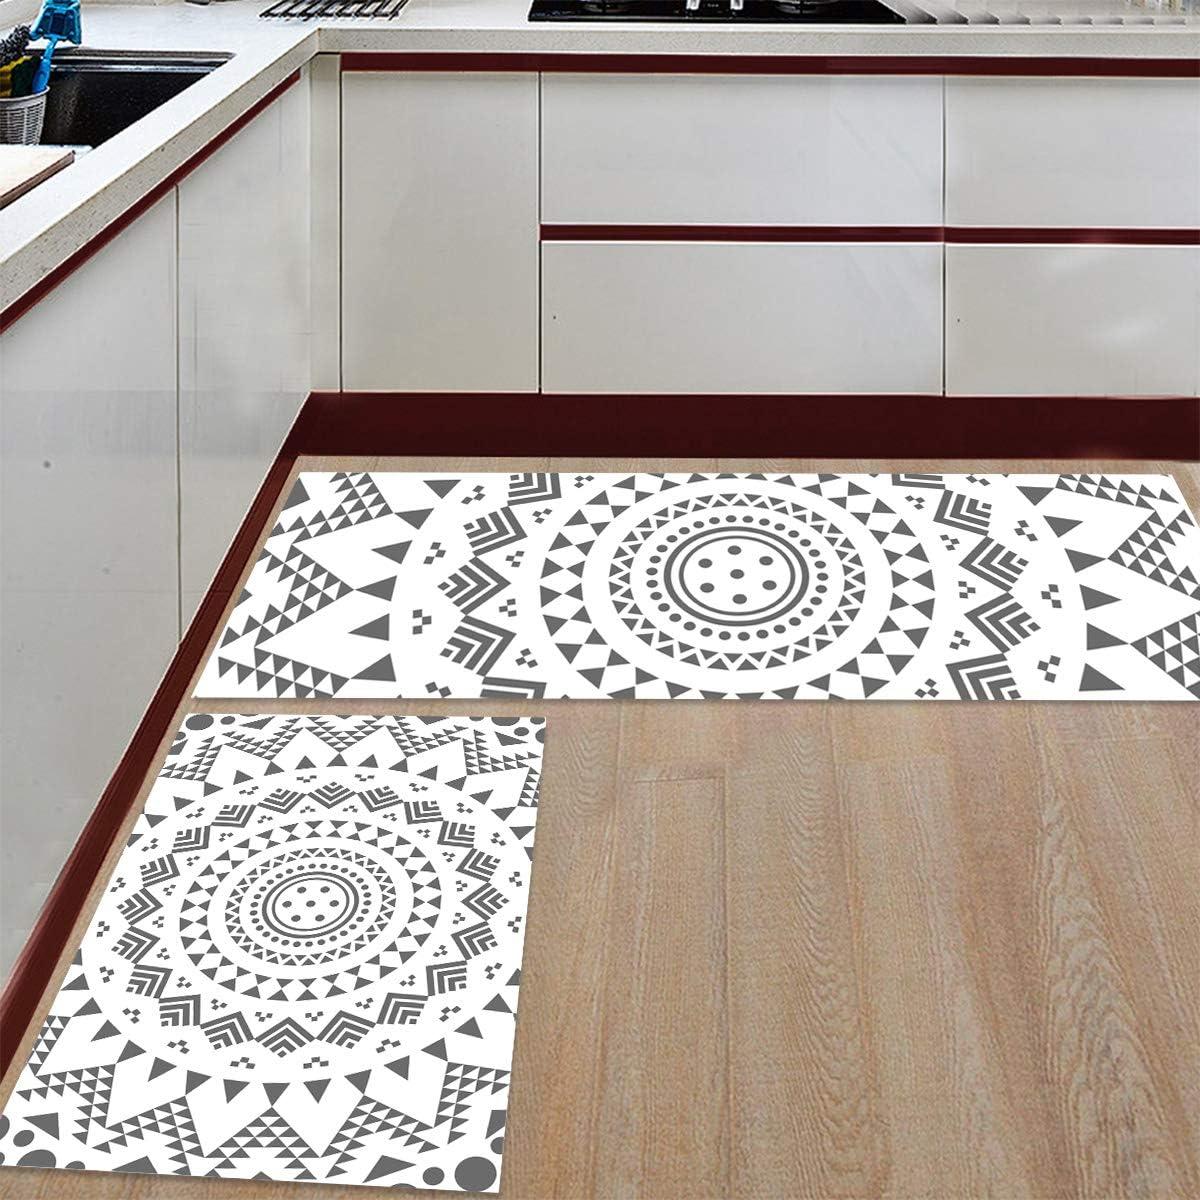 Prime Leader Kitchen Mat and Rugs Geo Set Fashionable Award-winning store of 2 Bohemian Mandala